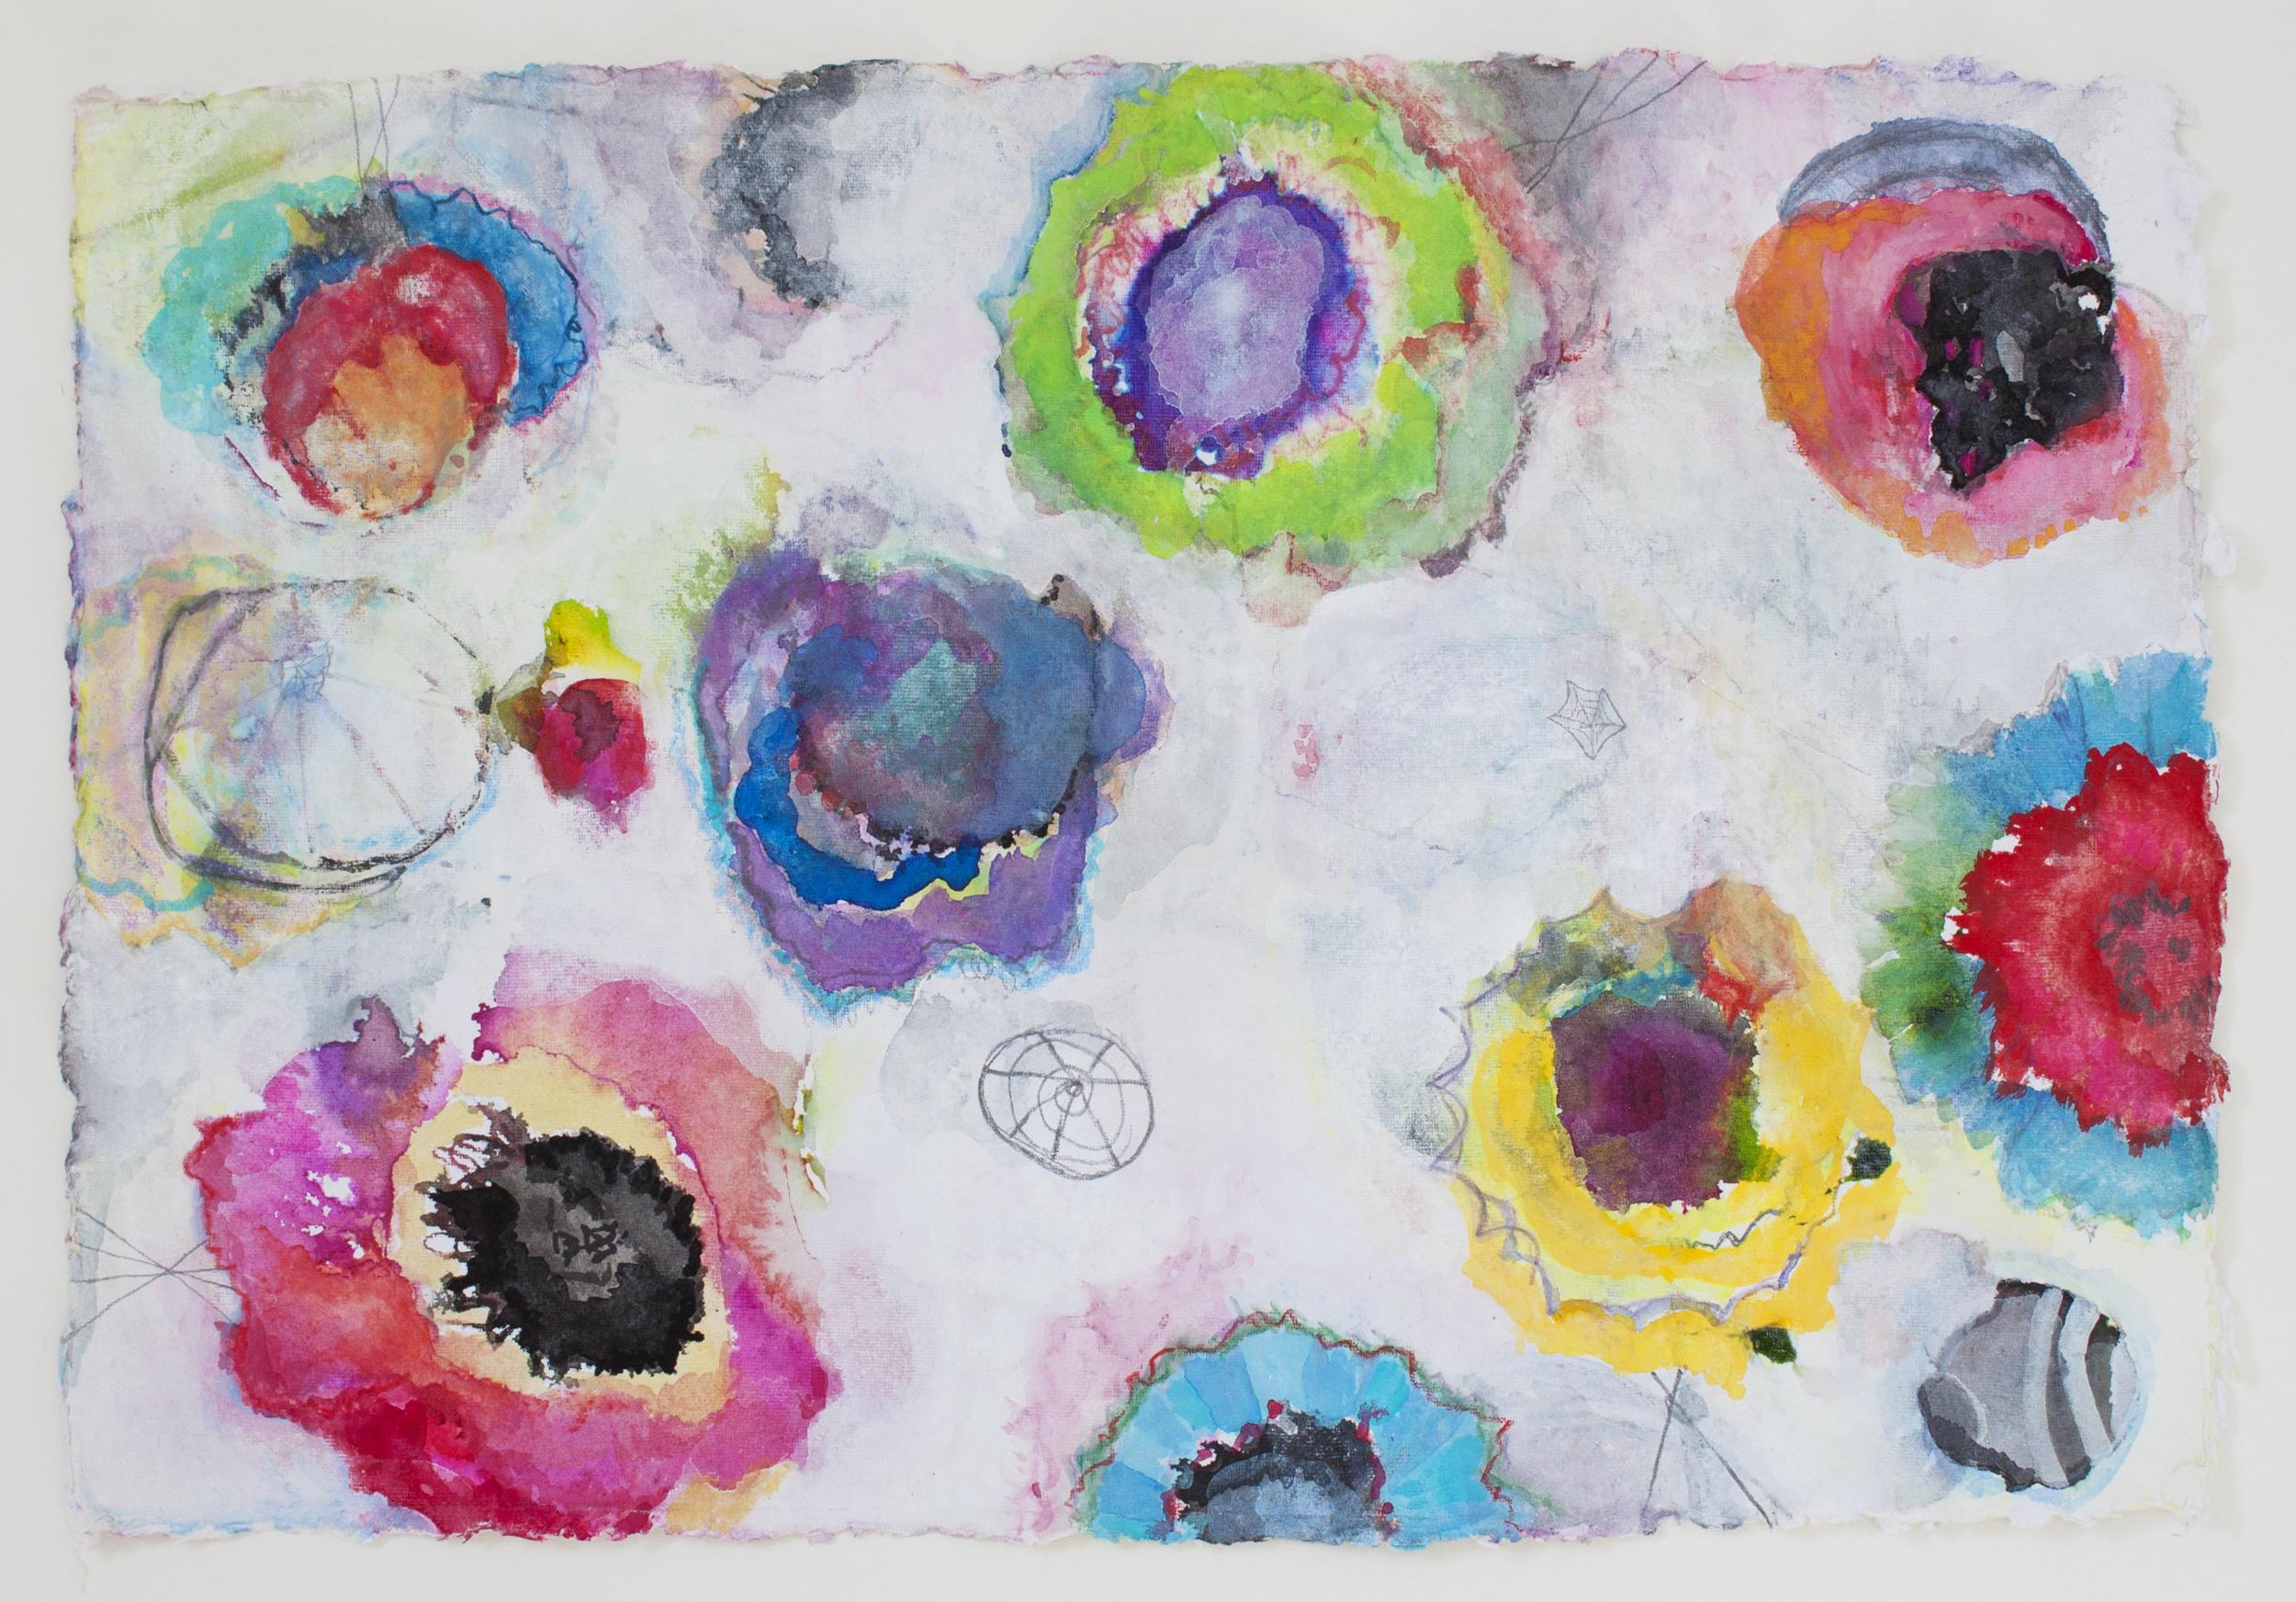 Poppies 4,  gouache, ink, graphite on handmade paper, 2013